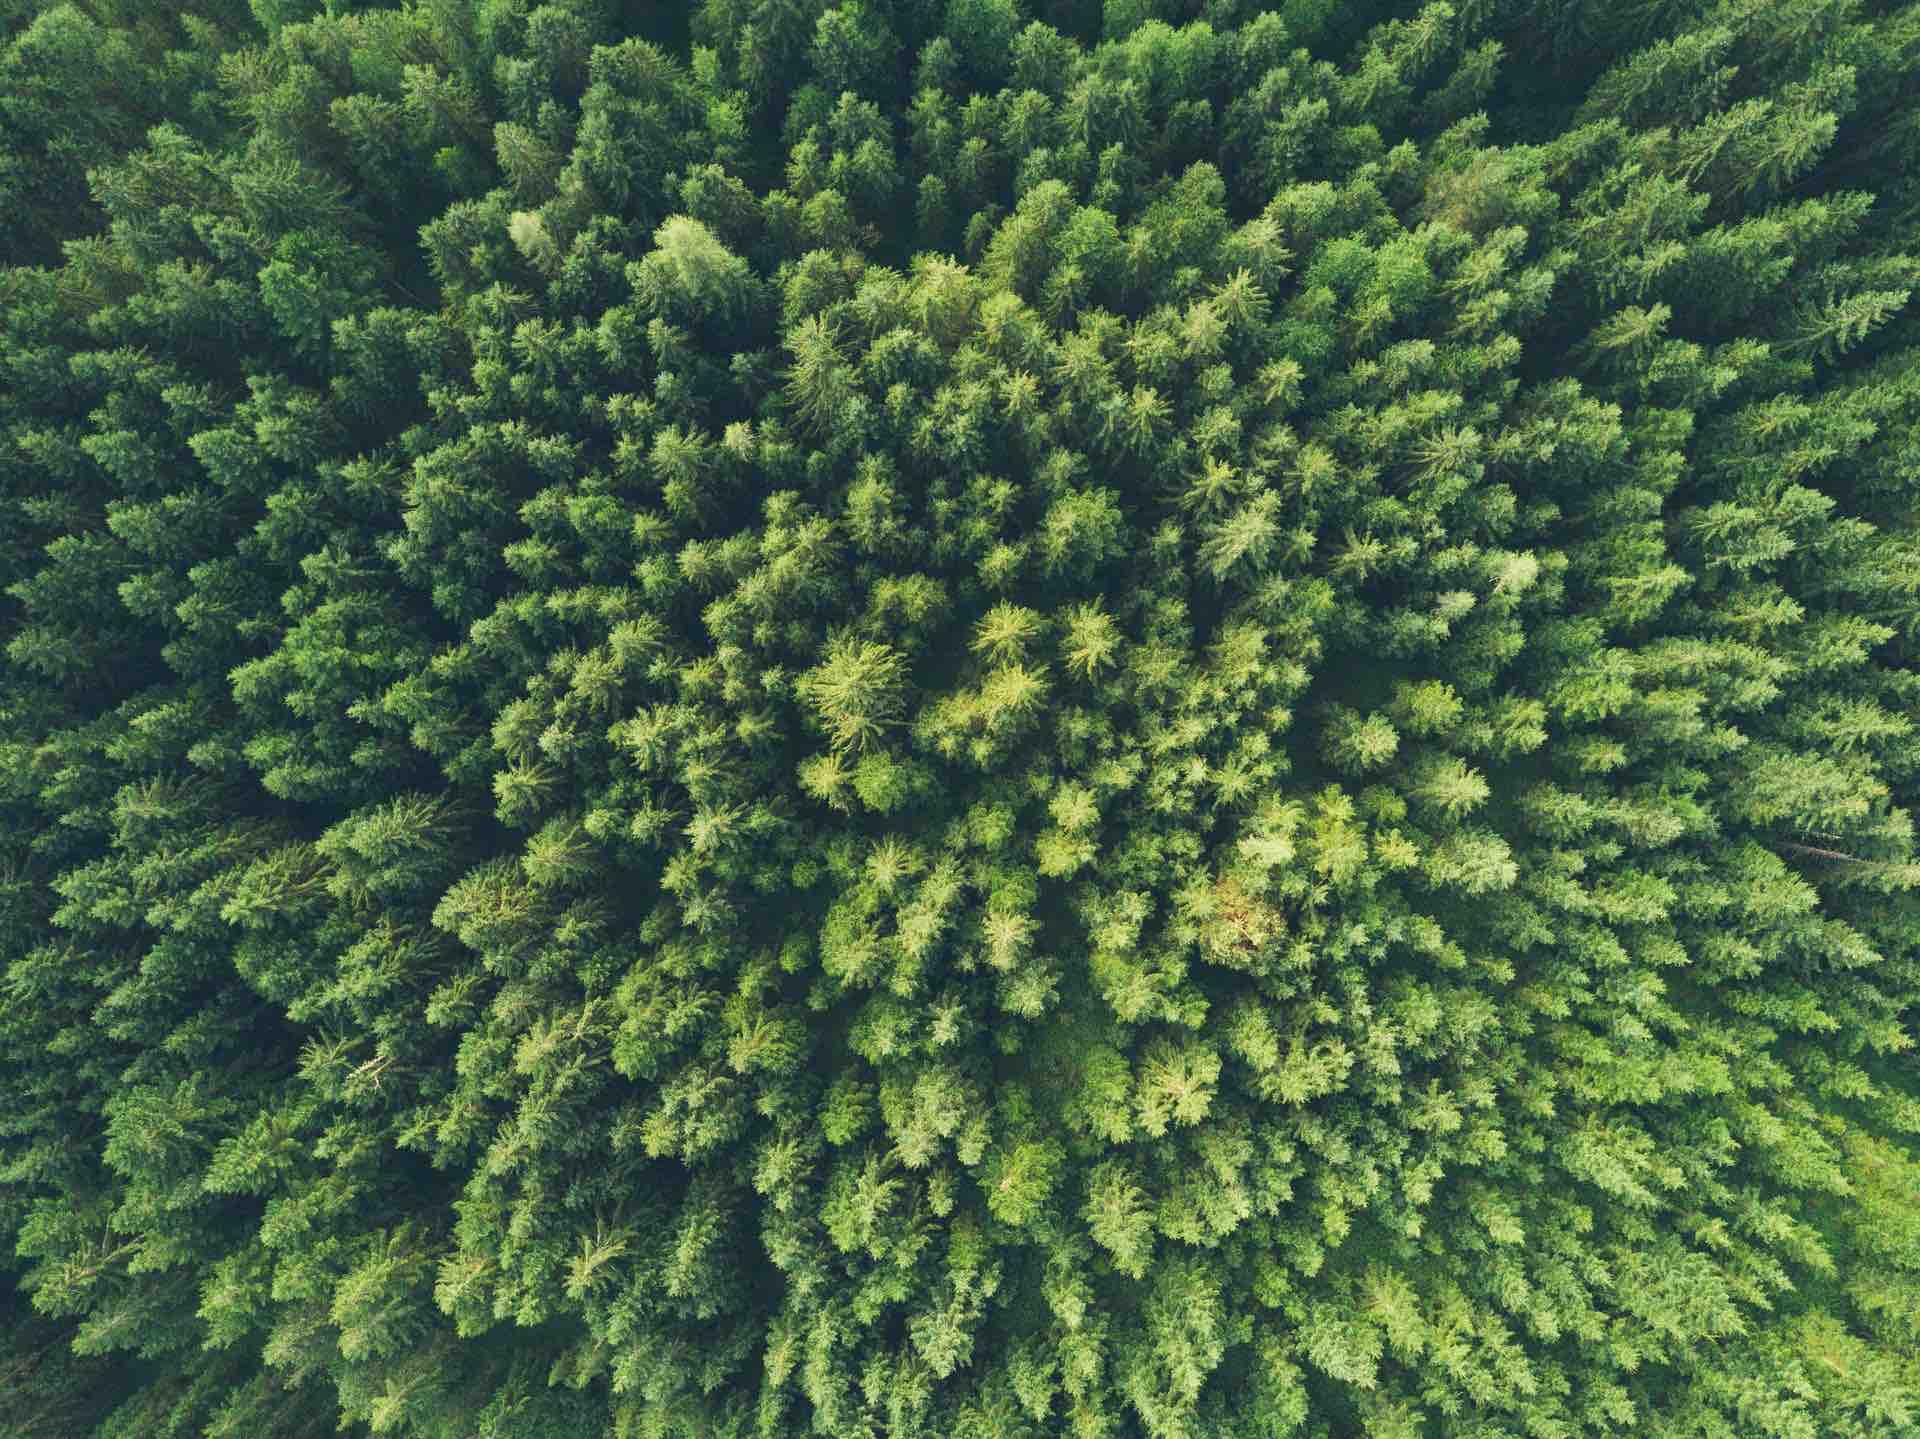 foret sapins nature environnement